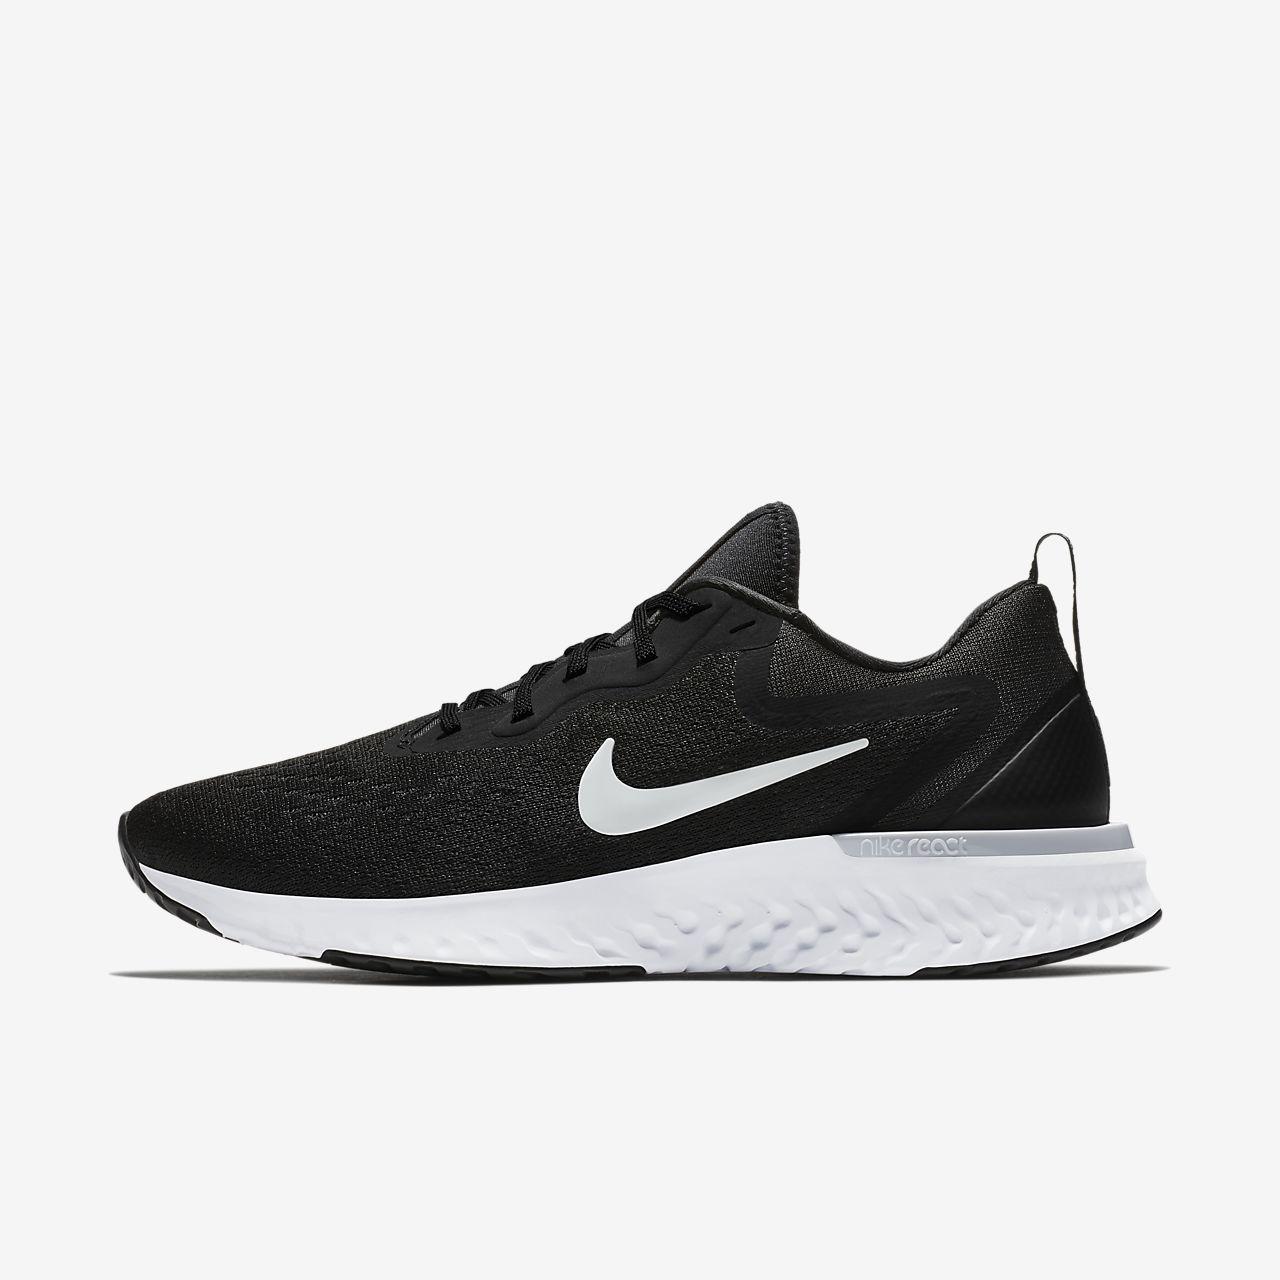 Chaussure de running Nike Odyssey React pour Femme . Nike FR